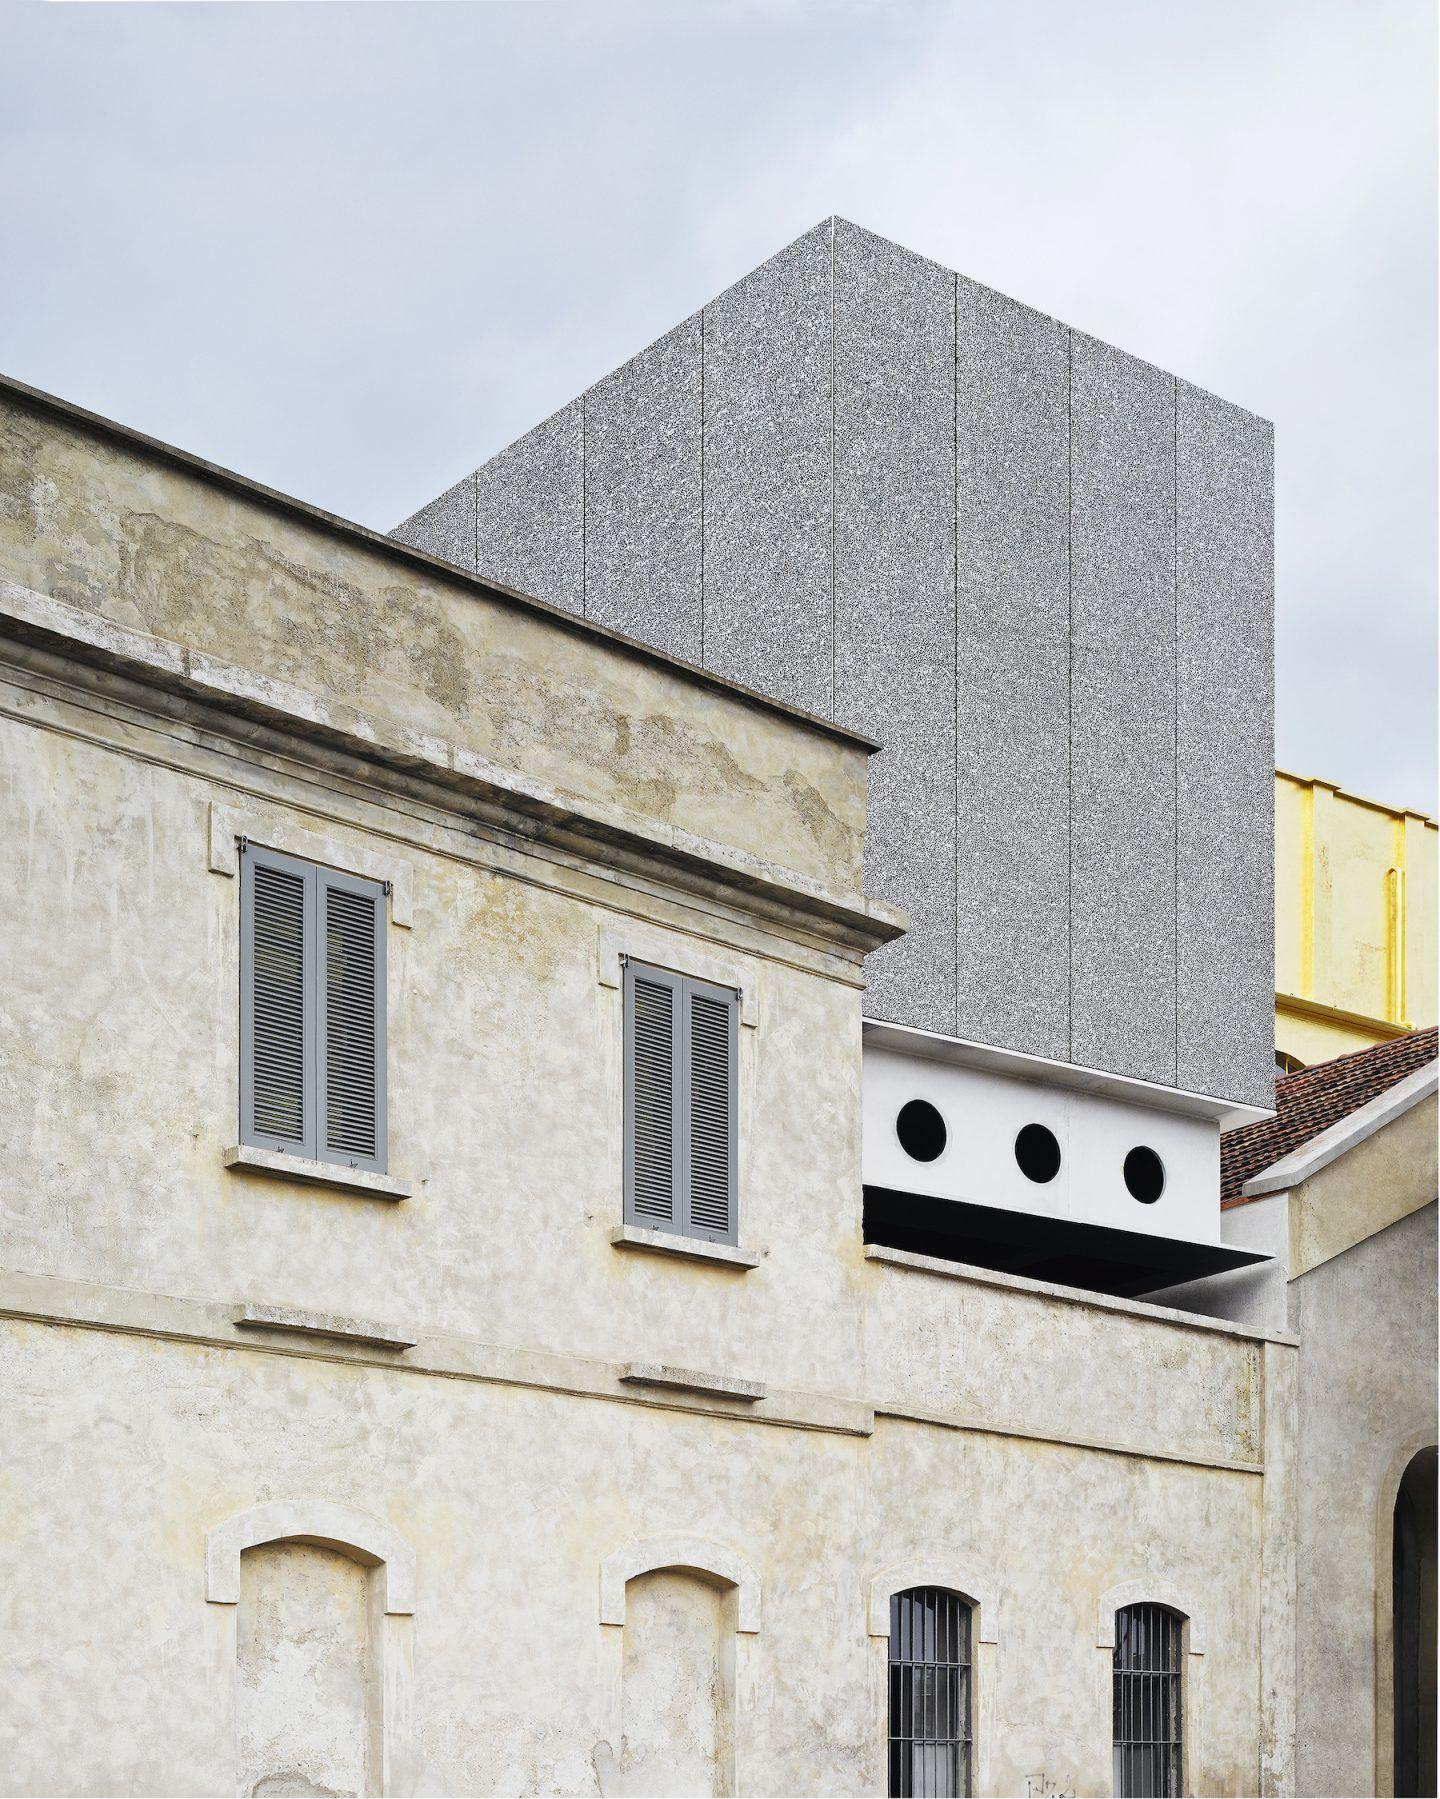 IGNANT-Travel-OMA-Fondazione-Prada-17